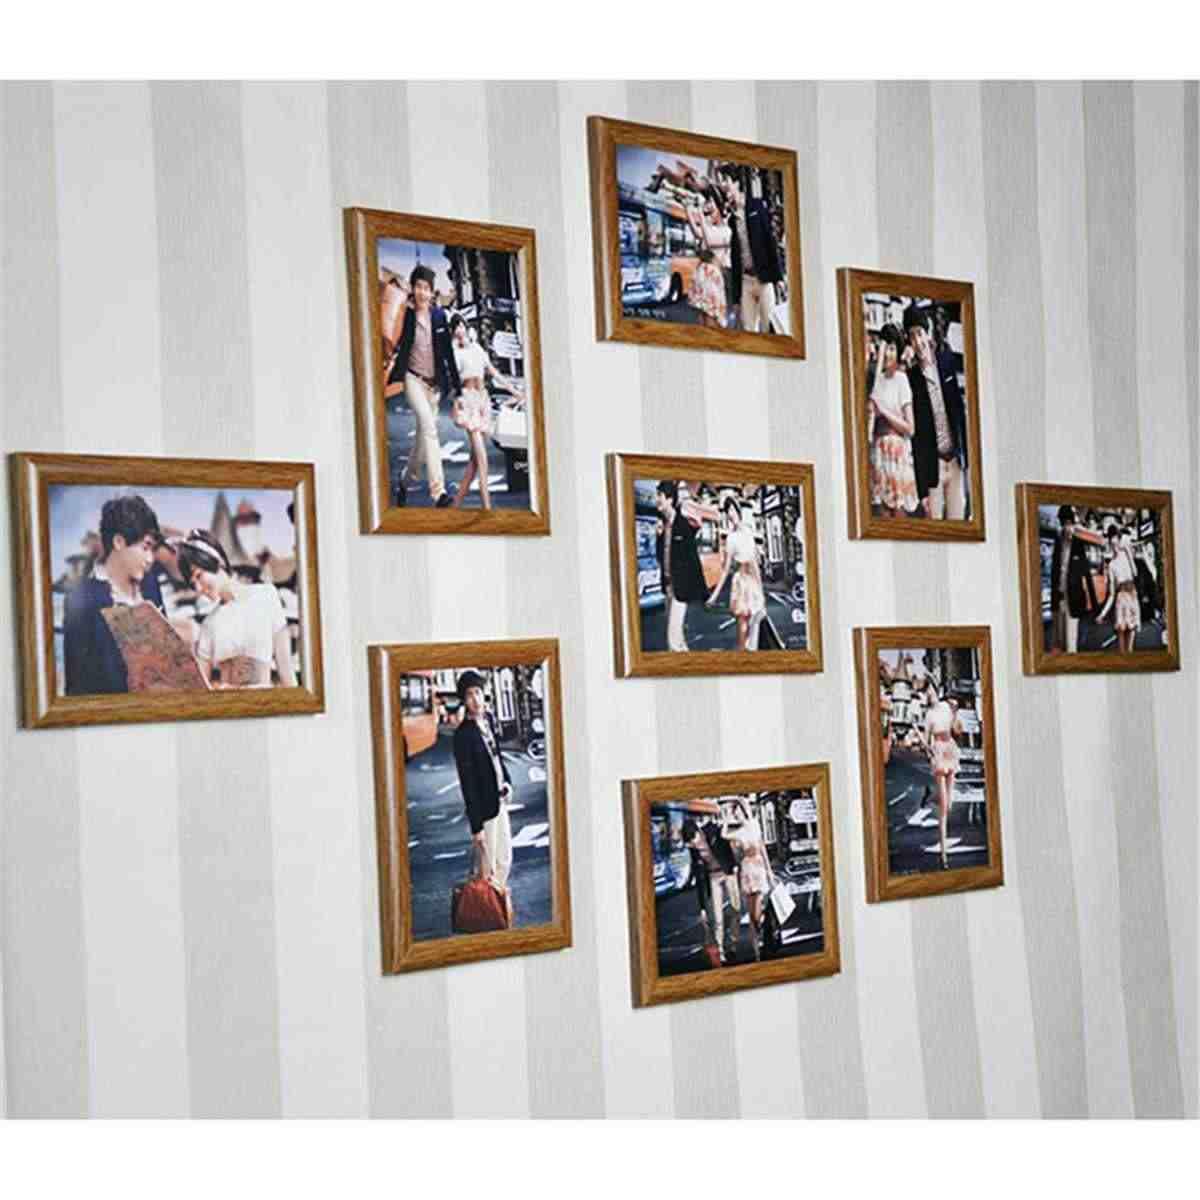 9 Pieces Mini Pictures Frames Retro Family Photo Frame Home Decor Art Wooden Wedding Vintage DIY Family Frame Home Decoration